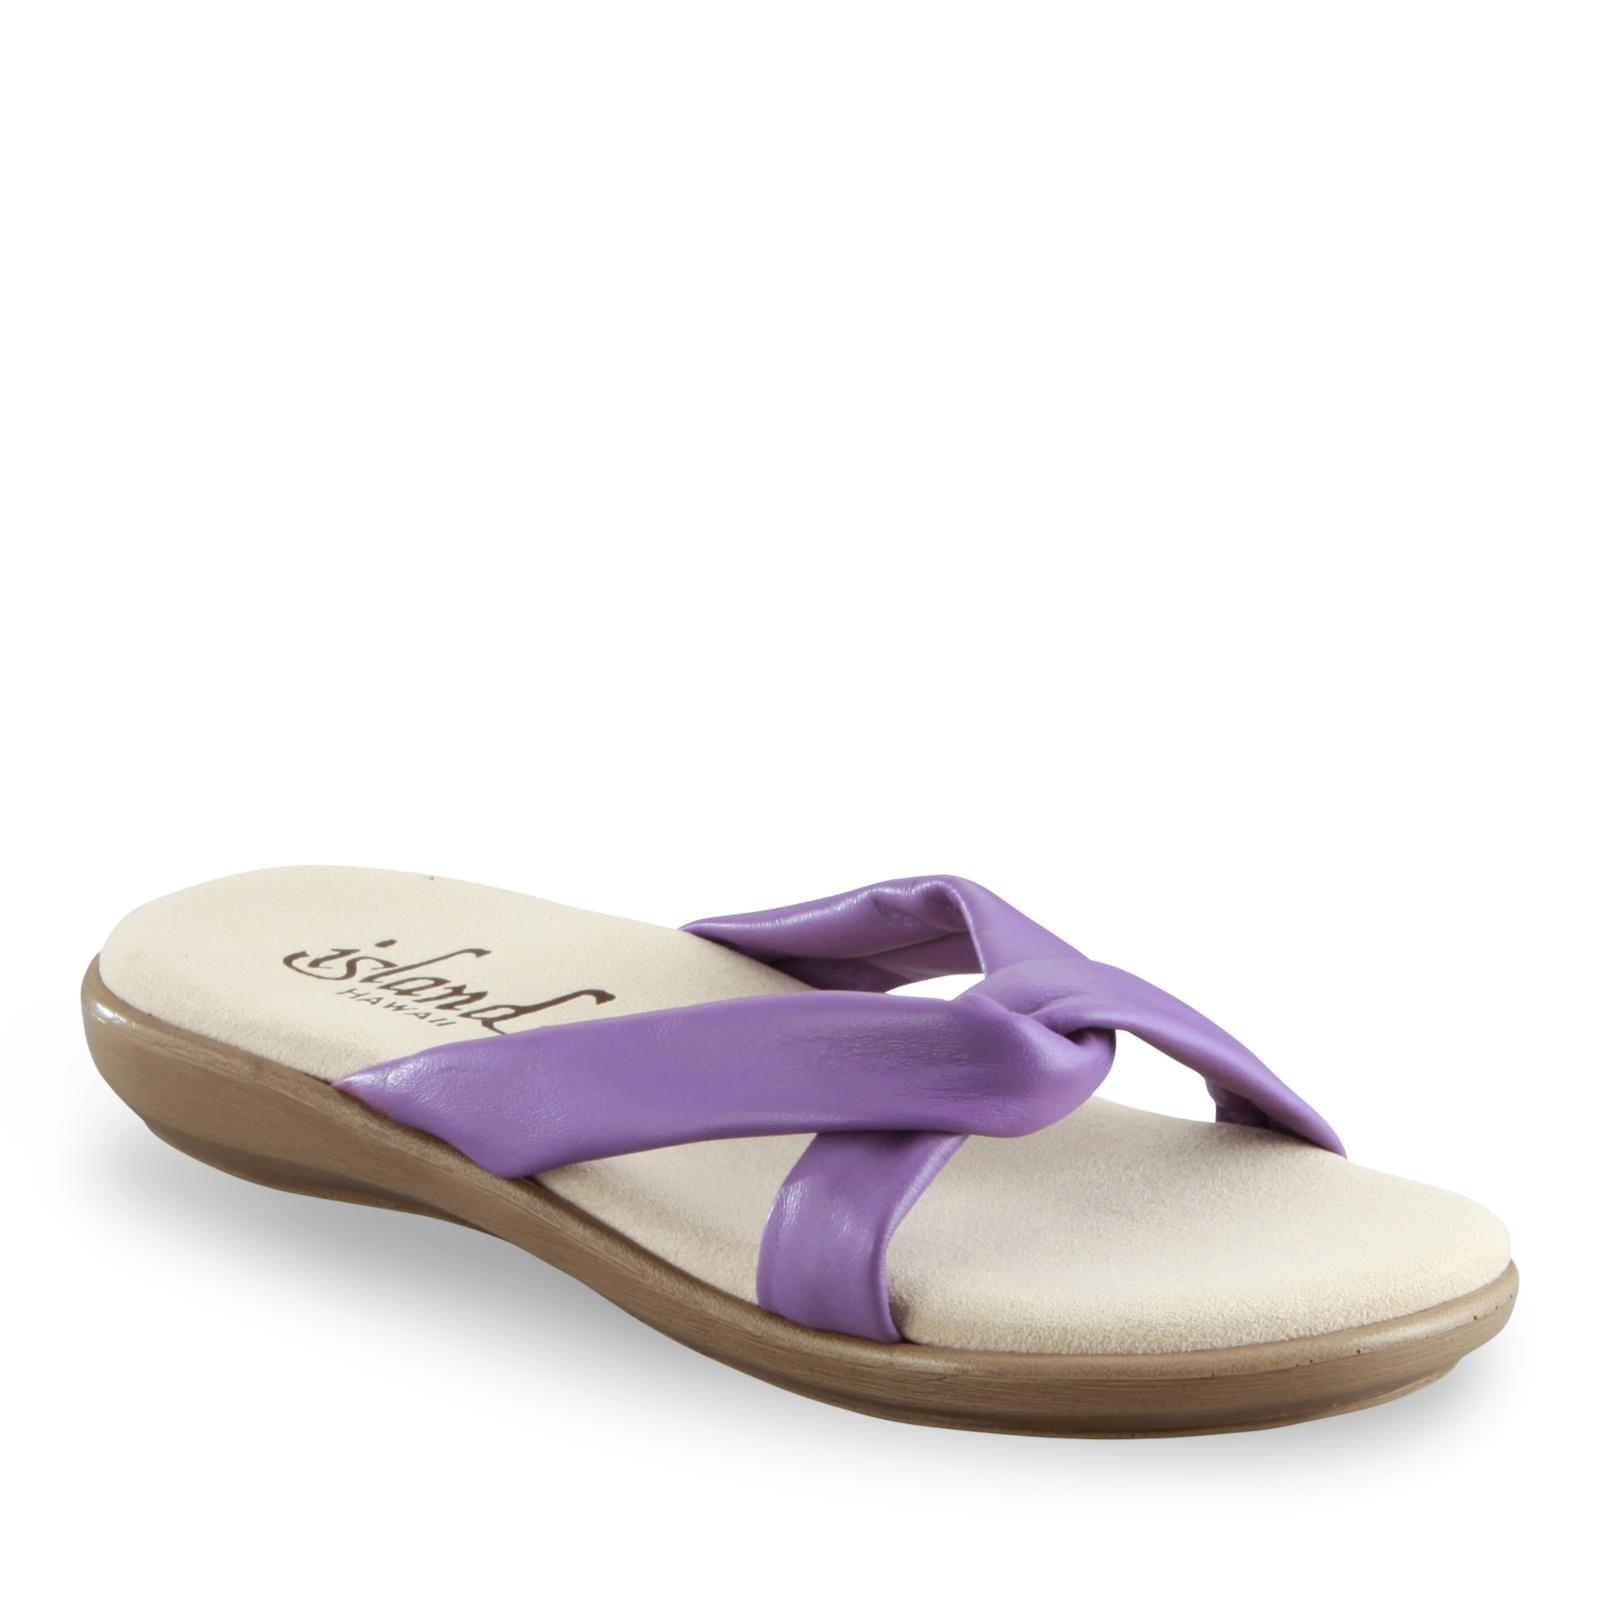 d4f3f7e05 Hawaiian Sandals For Women